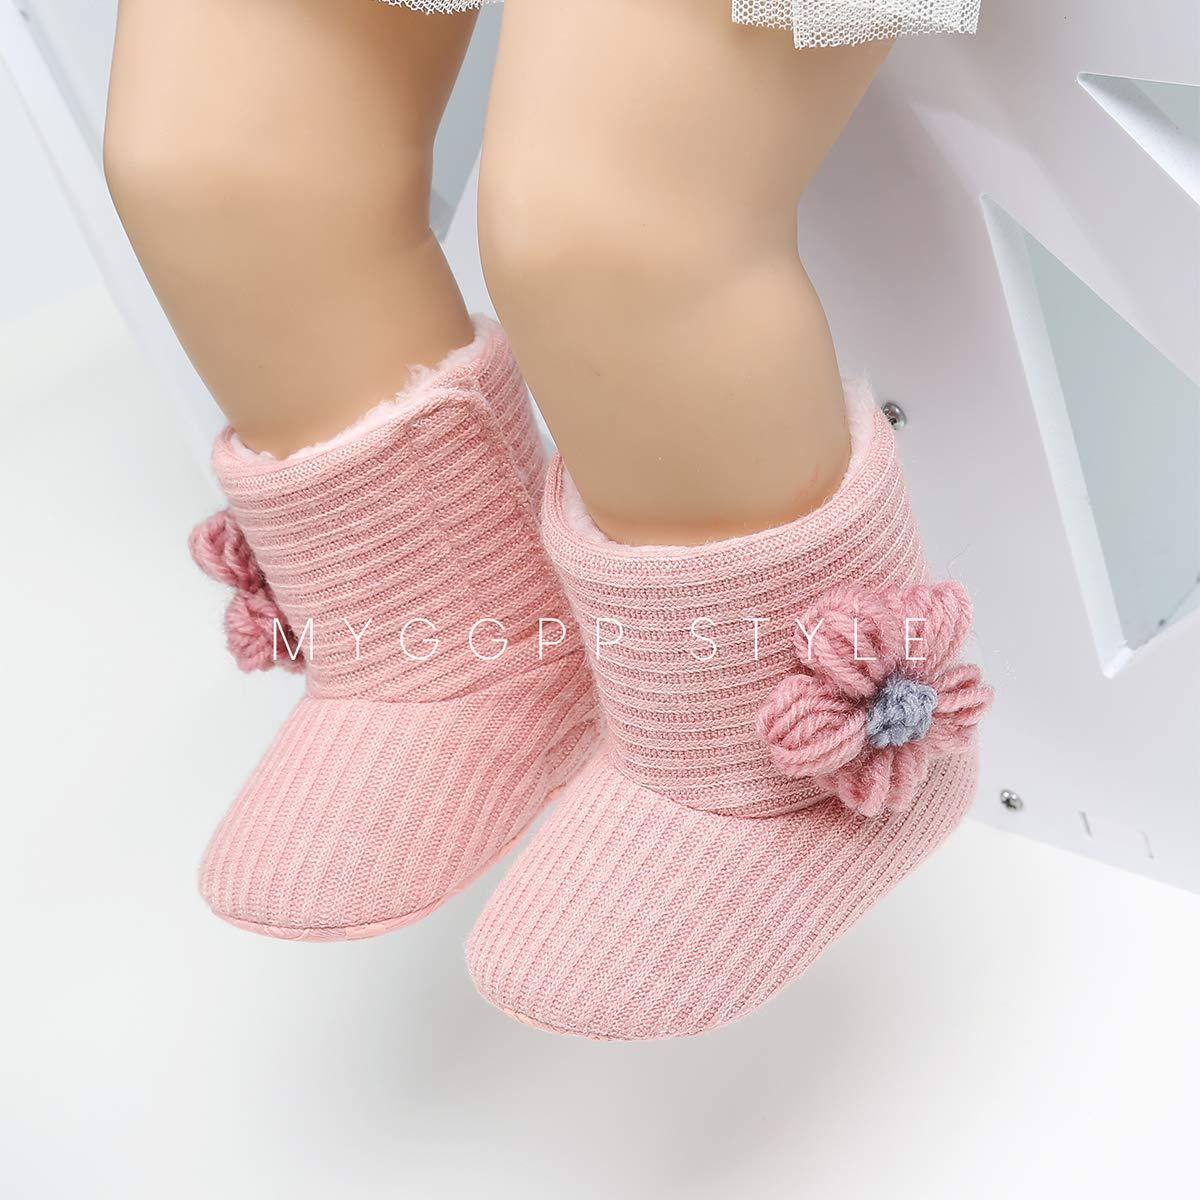 LIVEBOX Baby Premium Soft Sole Bow Anti-Slip Mid Calf Warm Winter Infant Prewalker Toddler Snow Boots